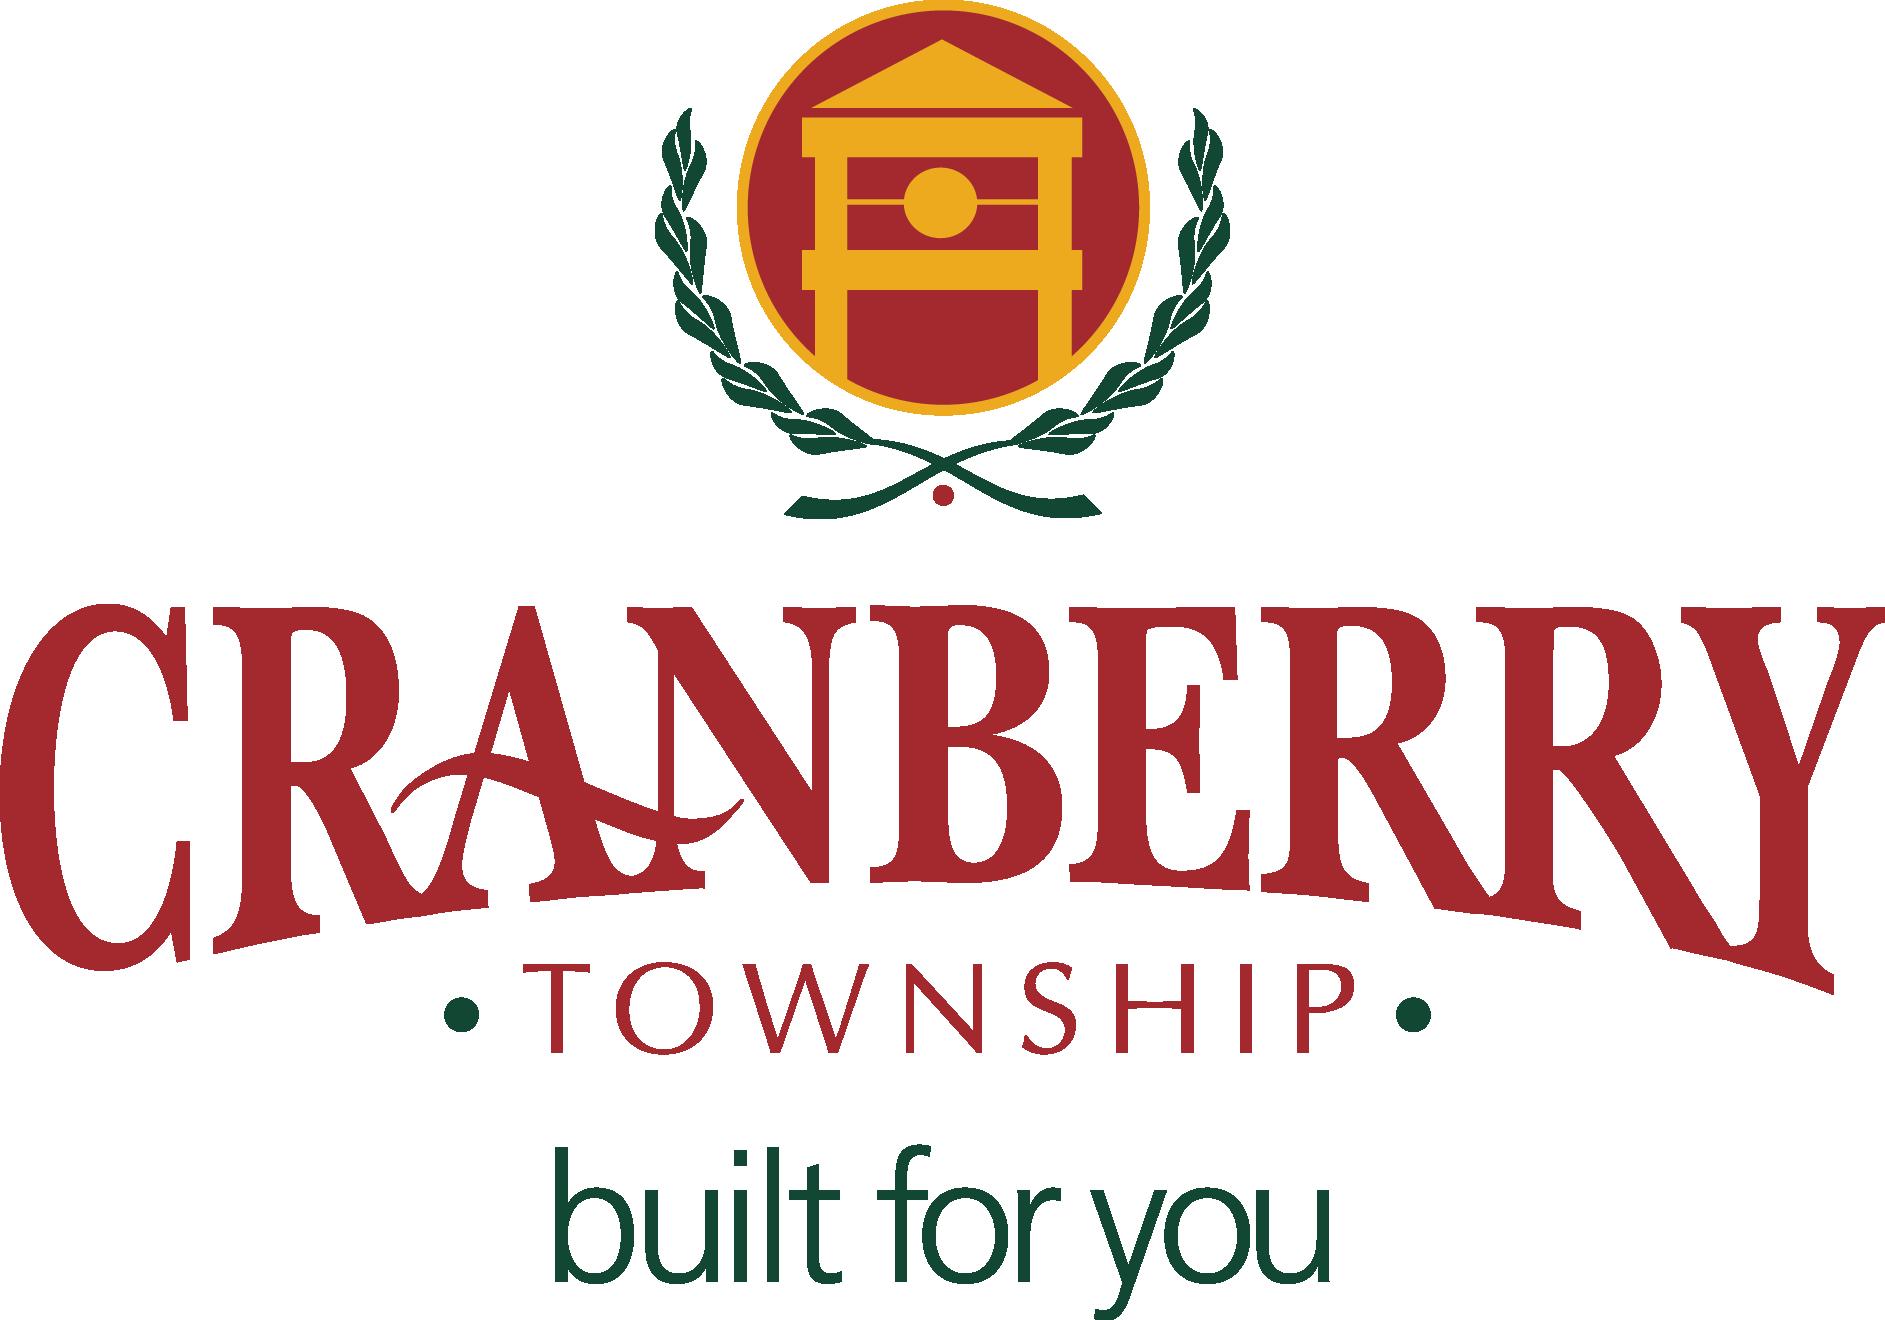 Cranberry Township's Logo